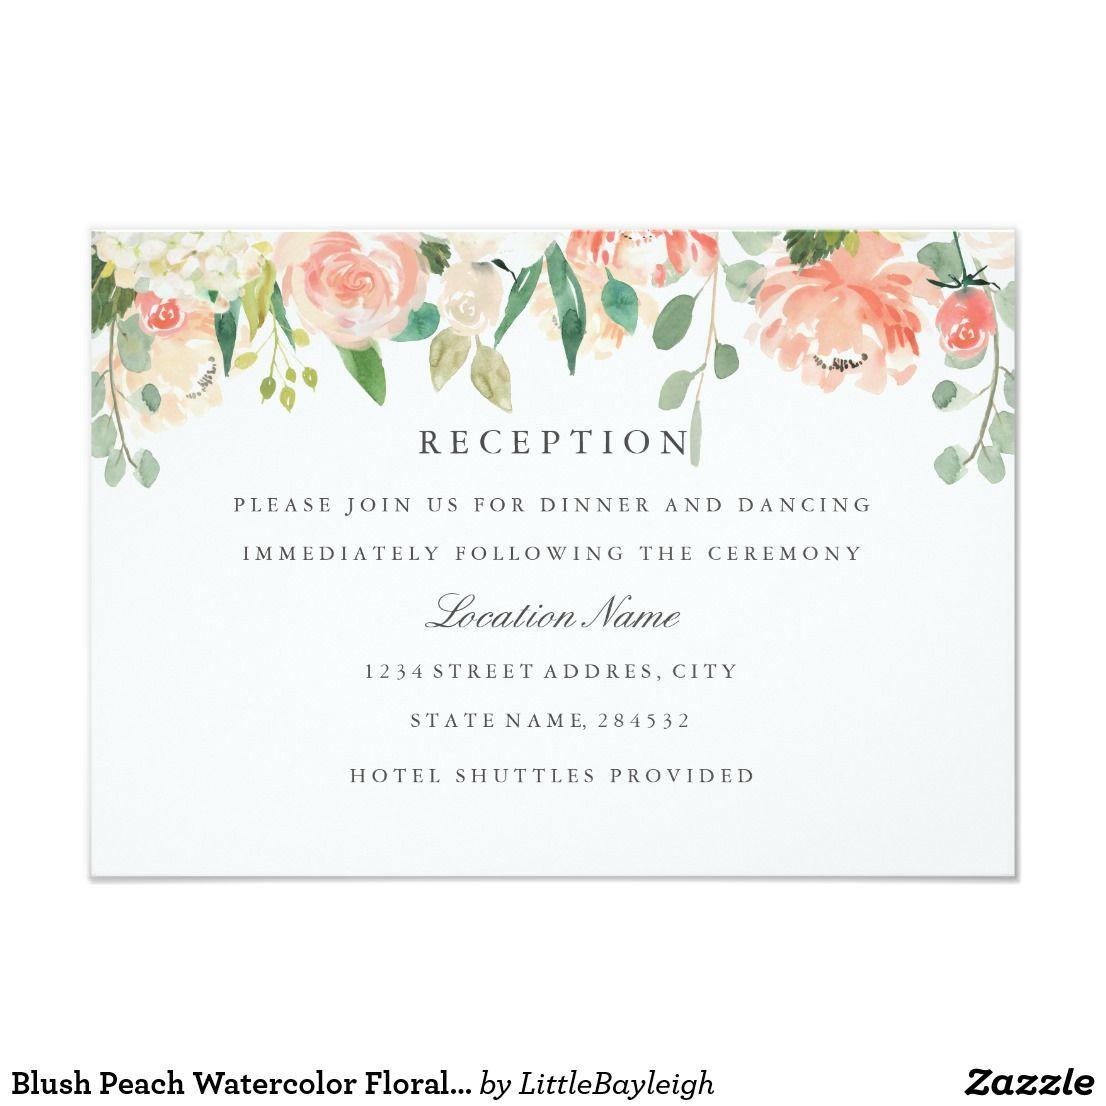 Blush Peach Watercolor Floral Wedding Reception Invitation ...